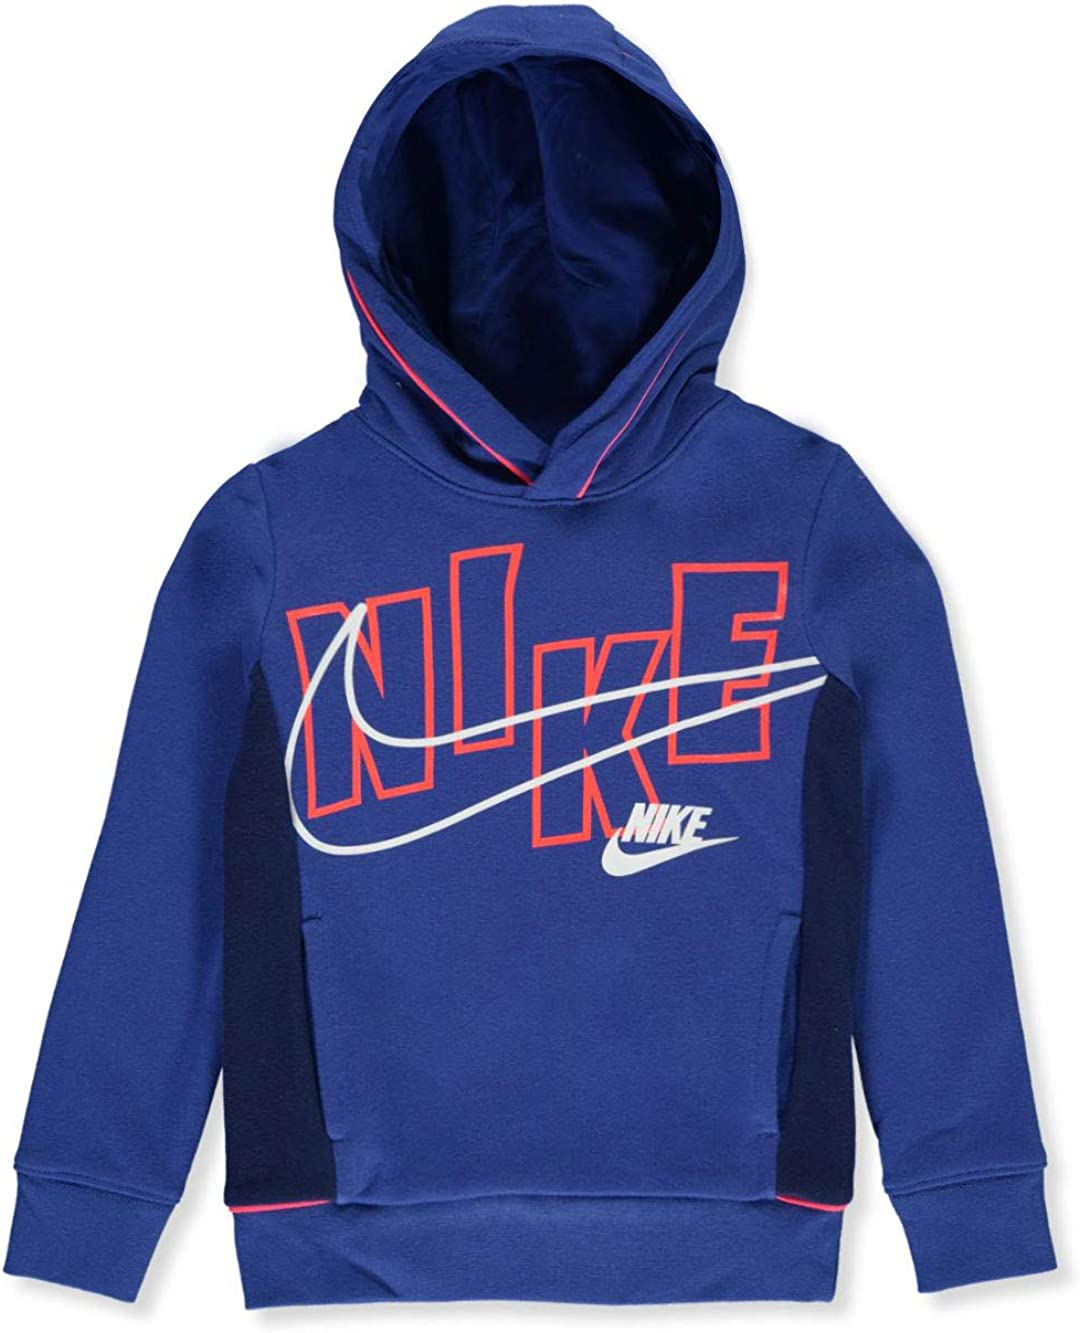 Nike Kids Boy's Dri-FIT Therma Long Sleeve Hooded T-Shirt (Toddler/Little Kids)